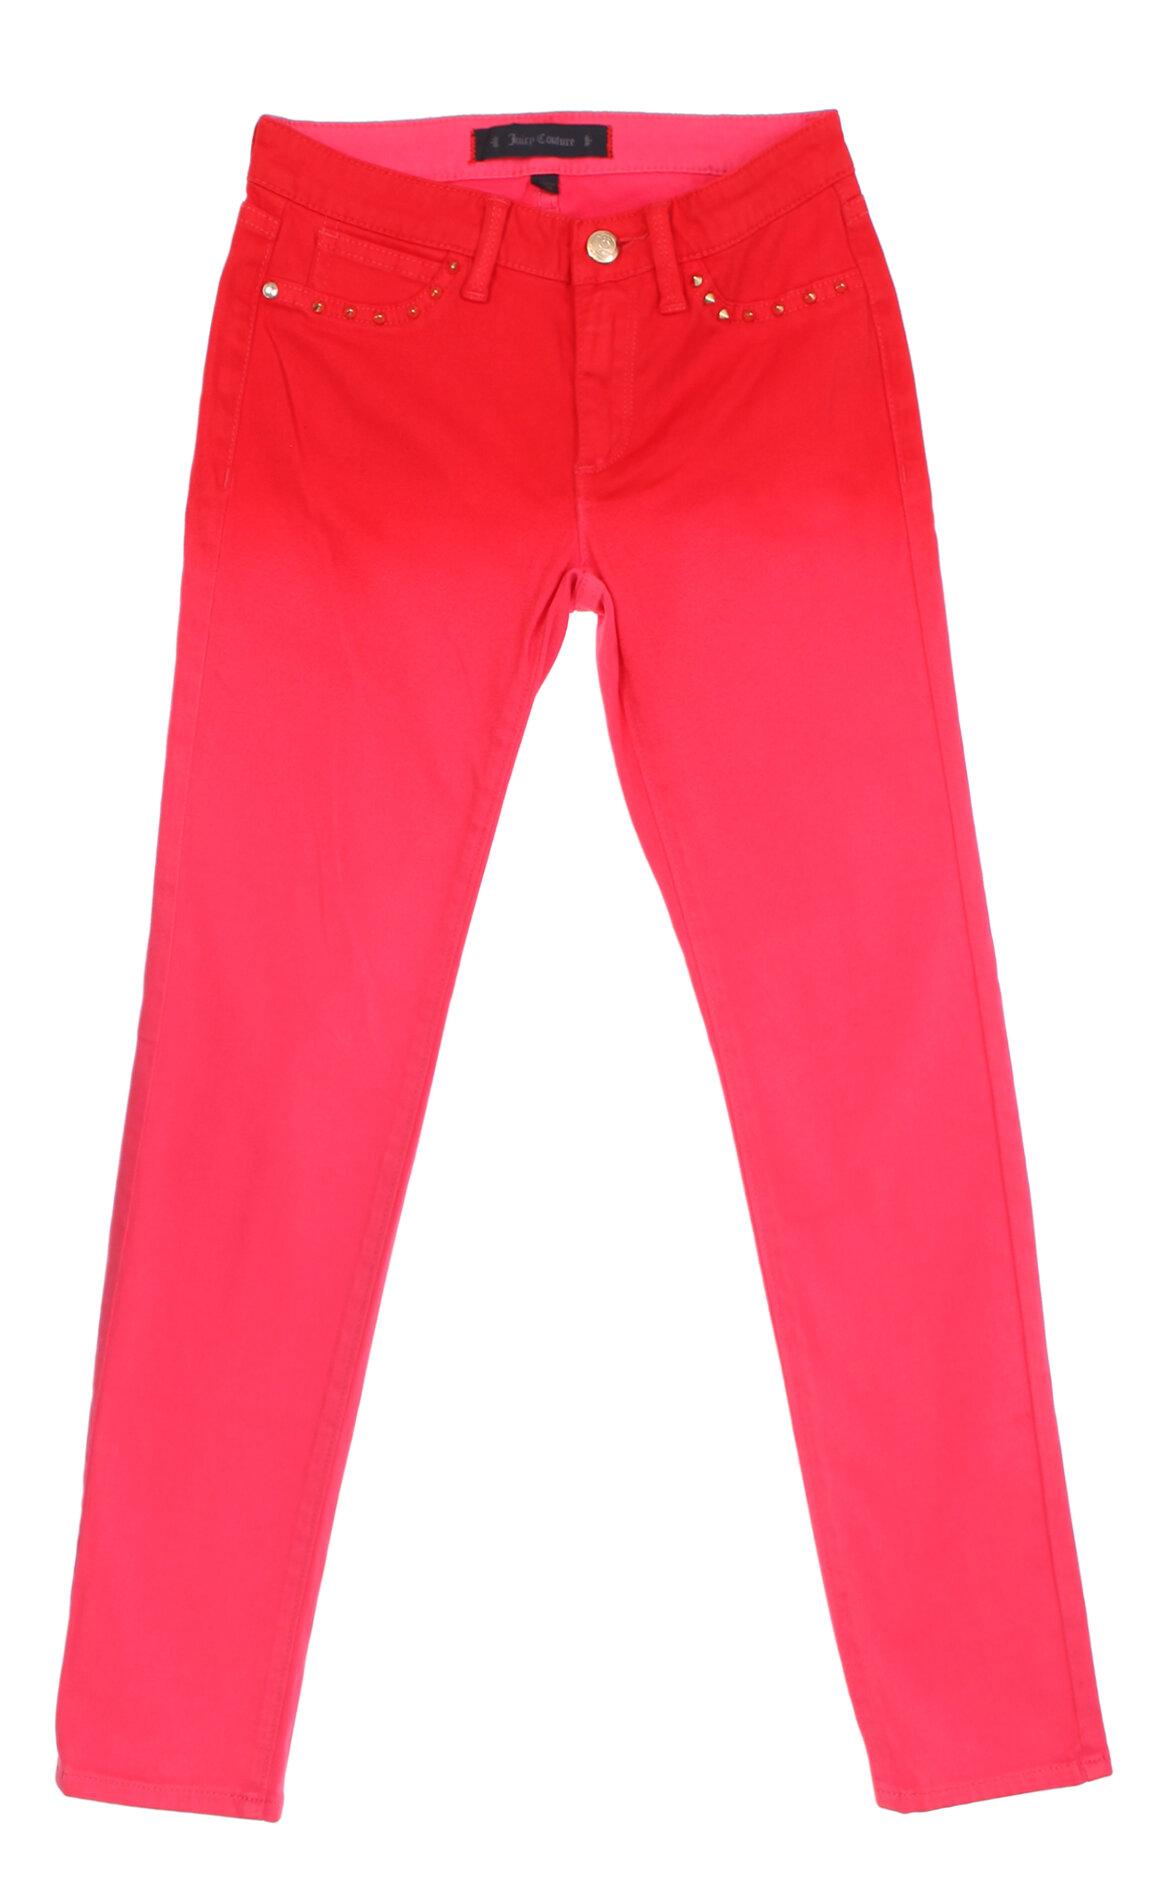 Juicy Couture-Juicy Couture Zımba Detaylı Kırmızı Kız Çocuk Pantolon